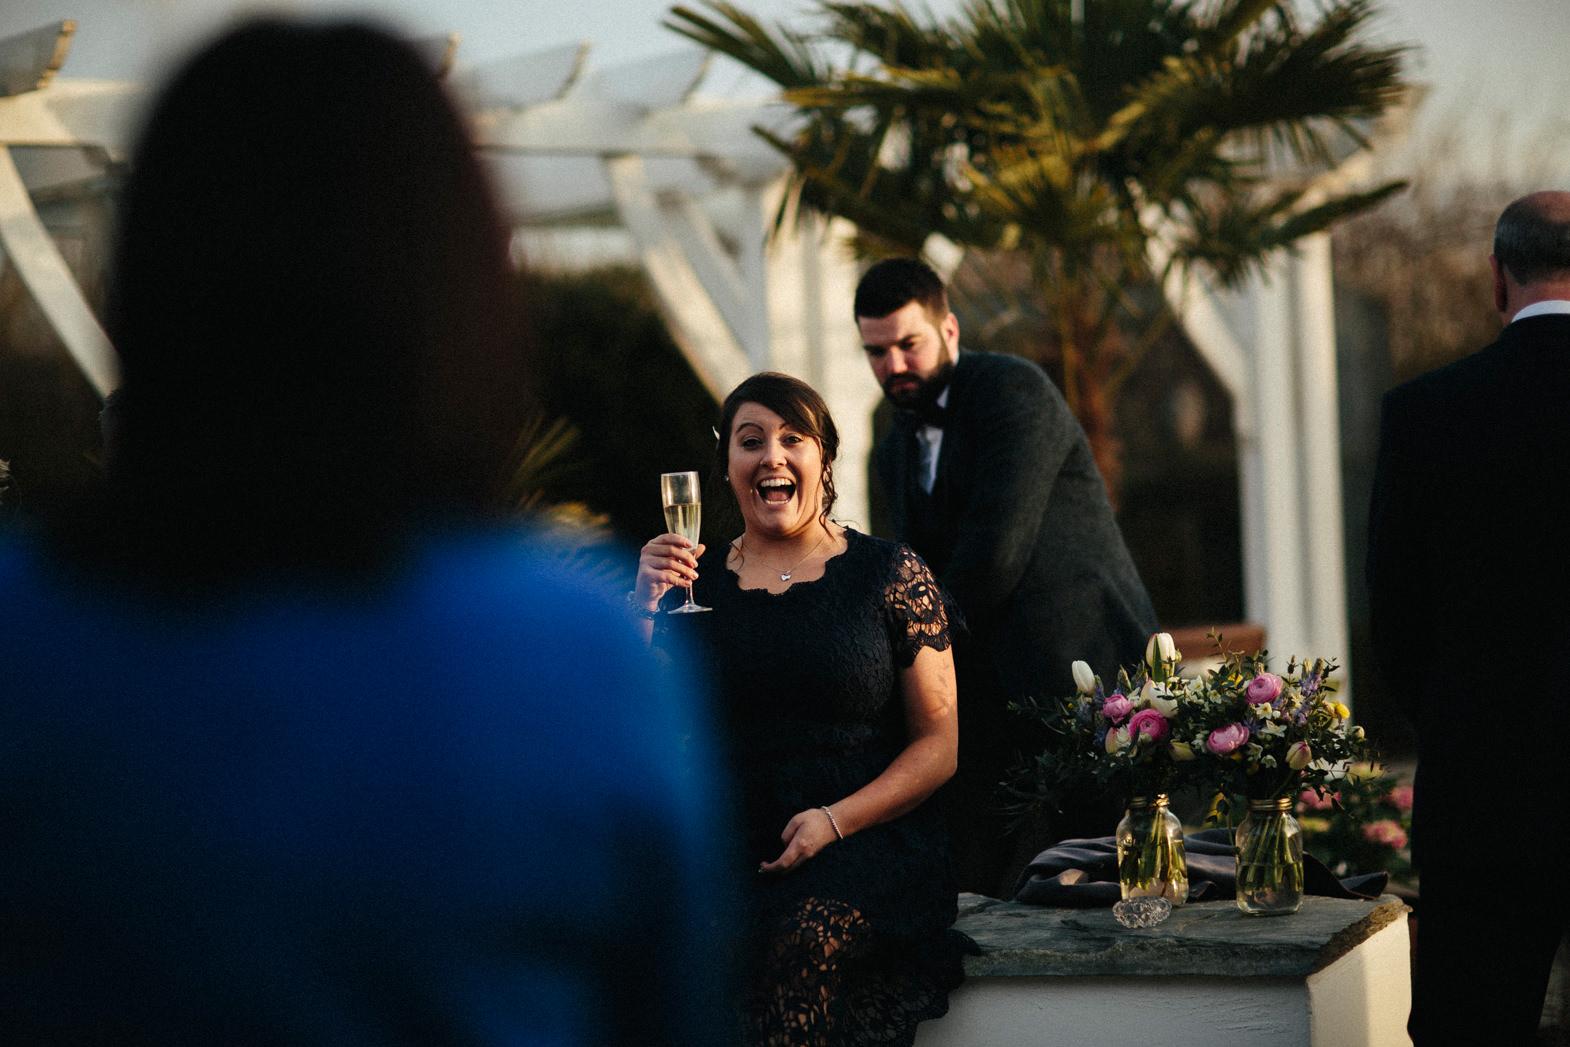 WEDDING PHOTOGRAPHy AT LOWER BARN (136).jpg